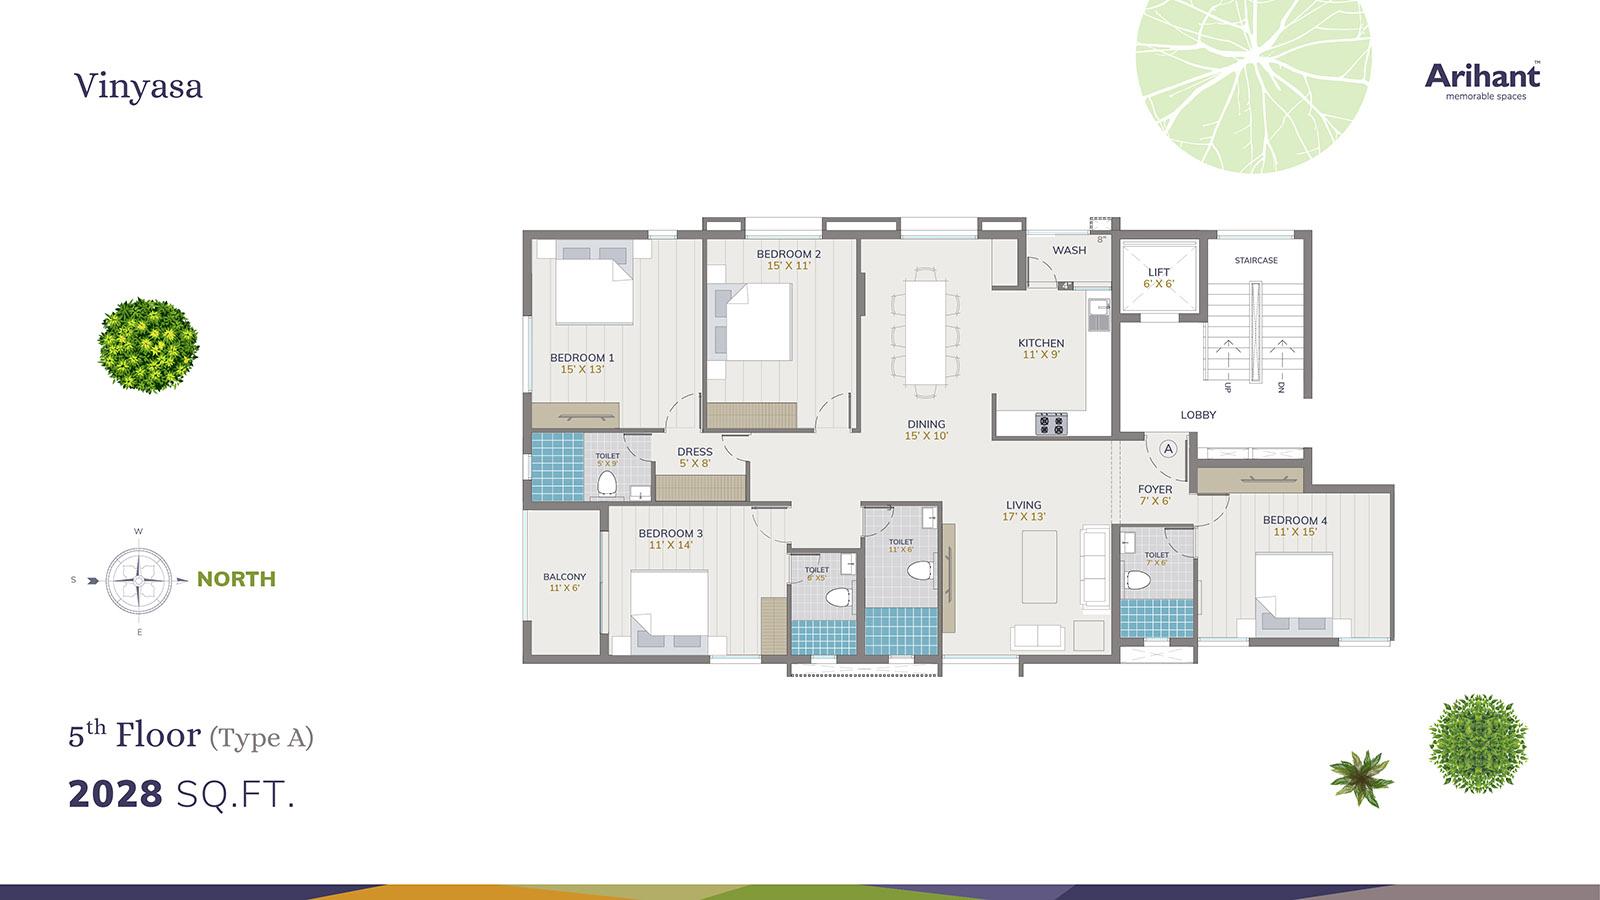 Arihant Vinyasa 5th Floor - Type A